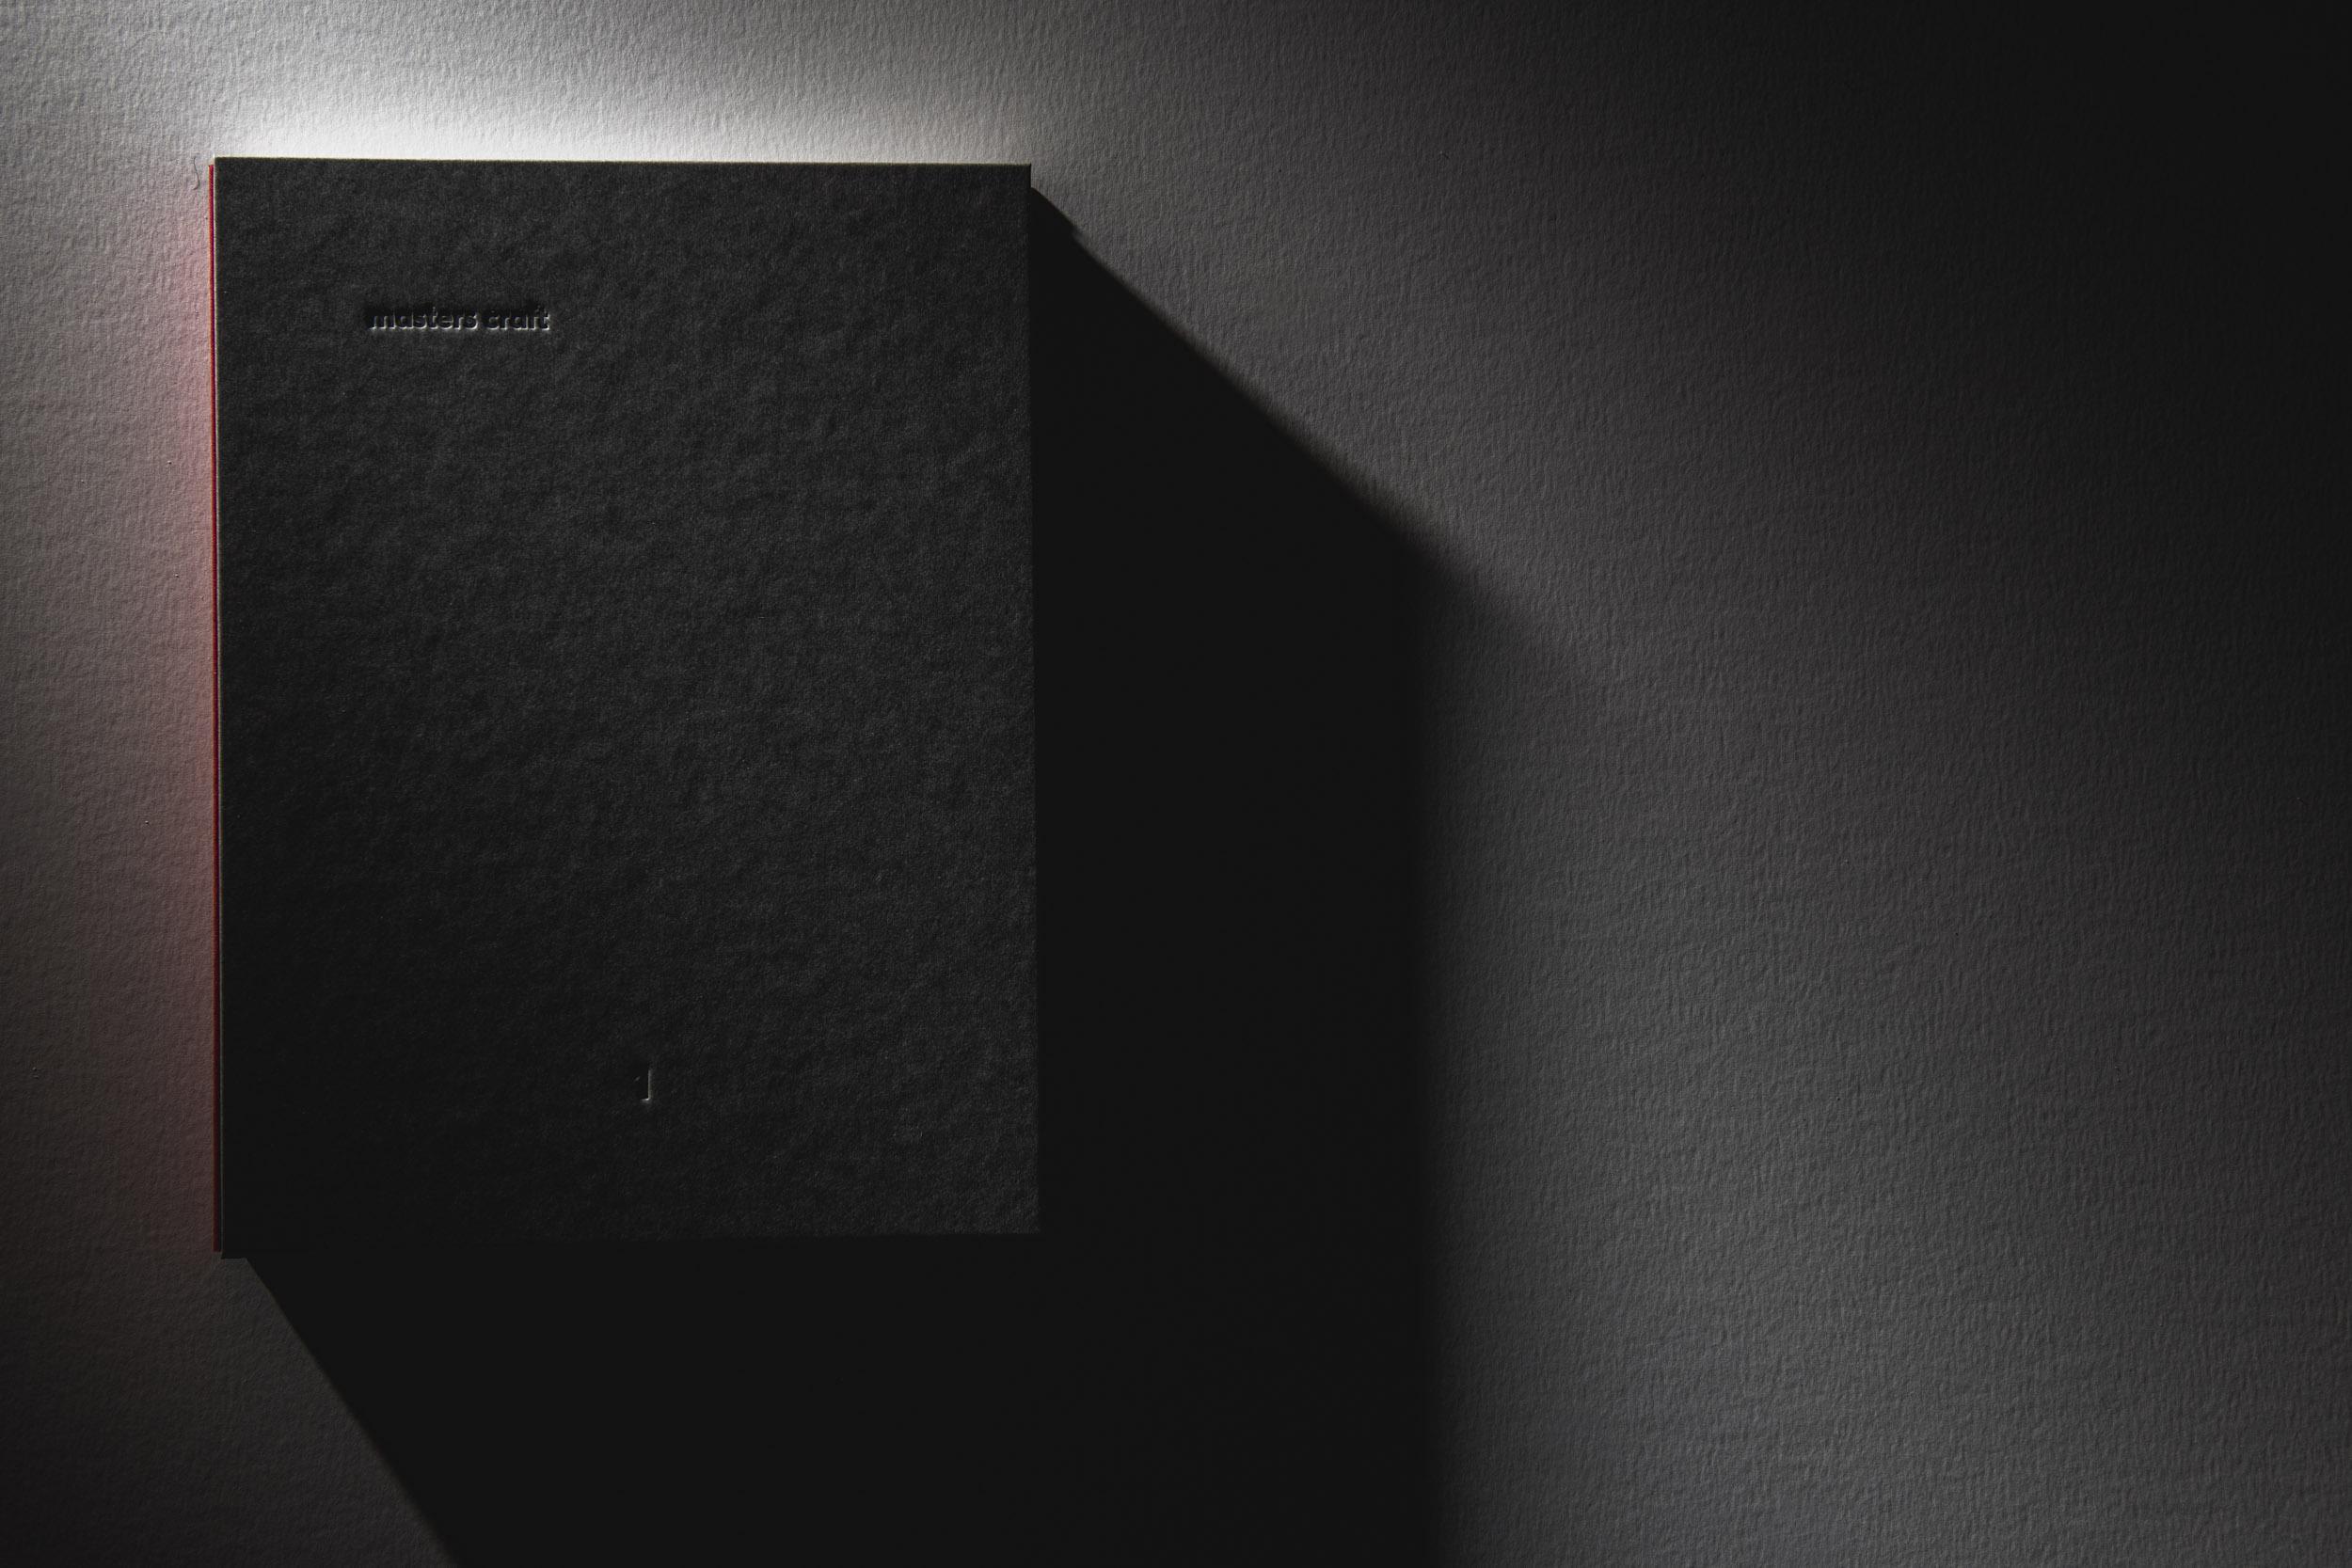 2018-SeifertUebler-martin-mayr-masters-craft-volume1-book-print002.jpg